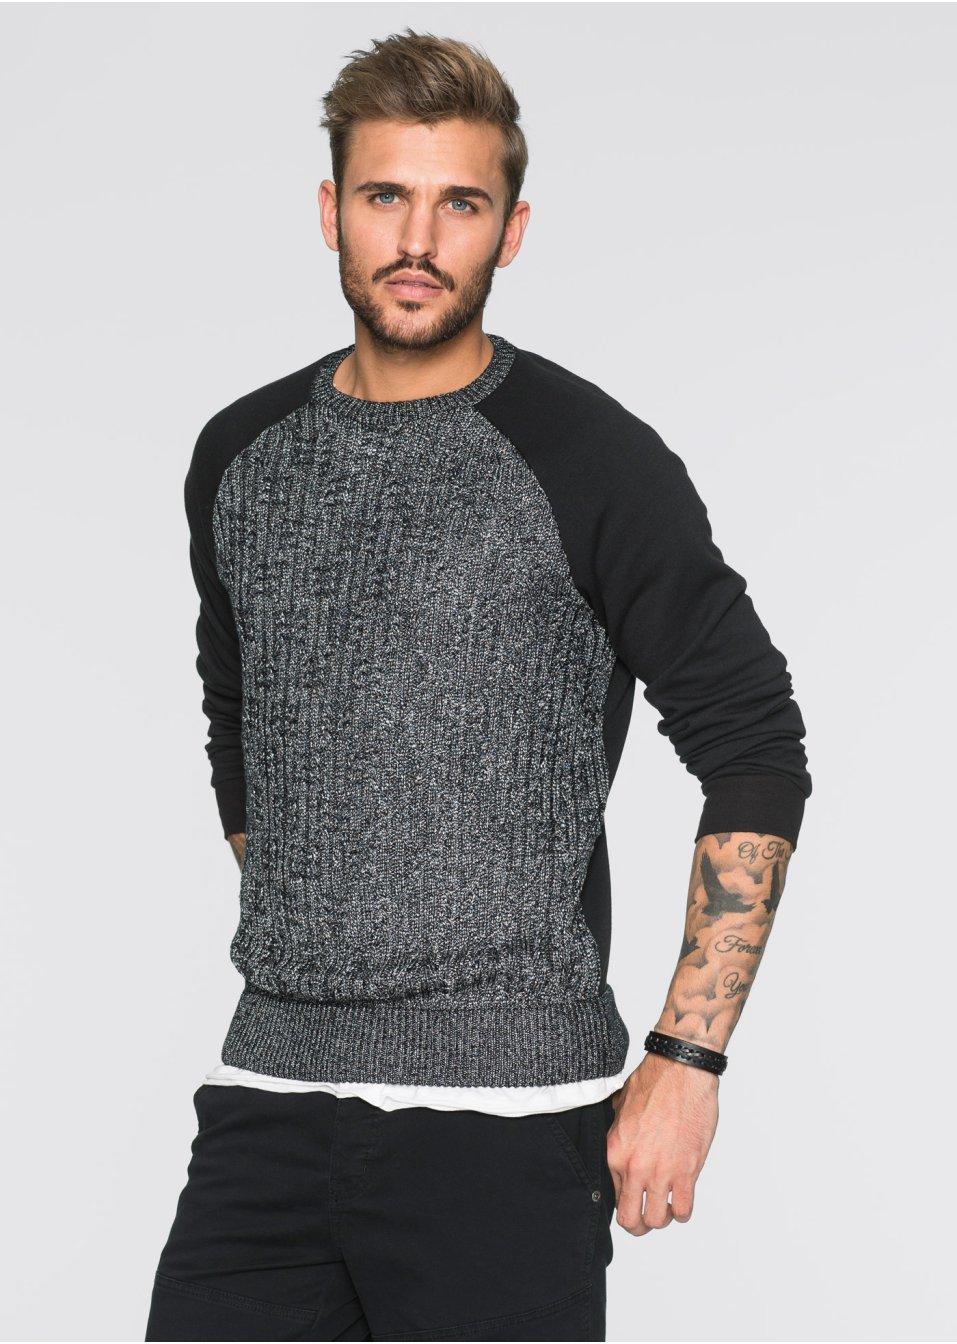 Pulovere barbati toamna 2016, pulovere tricotate barbati toamna